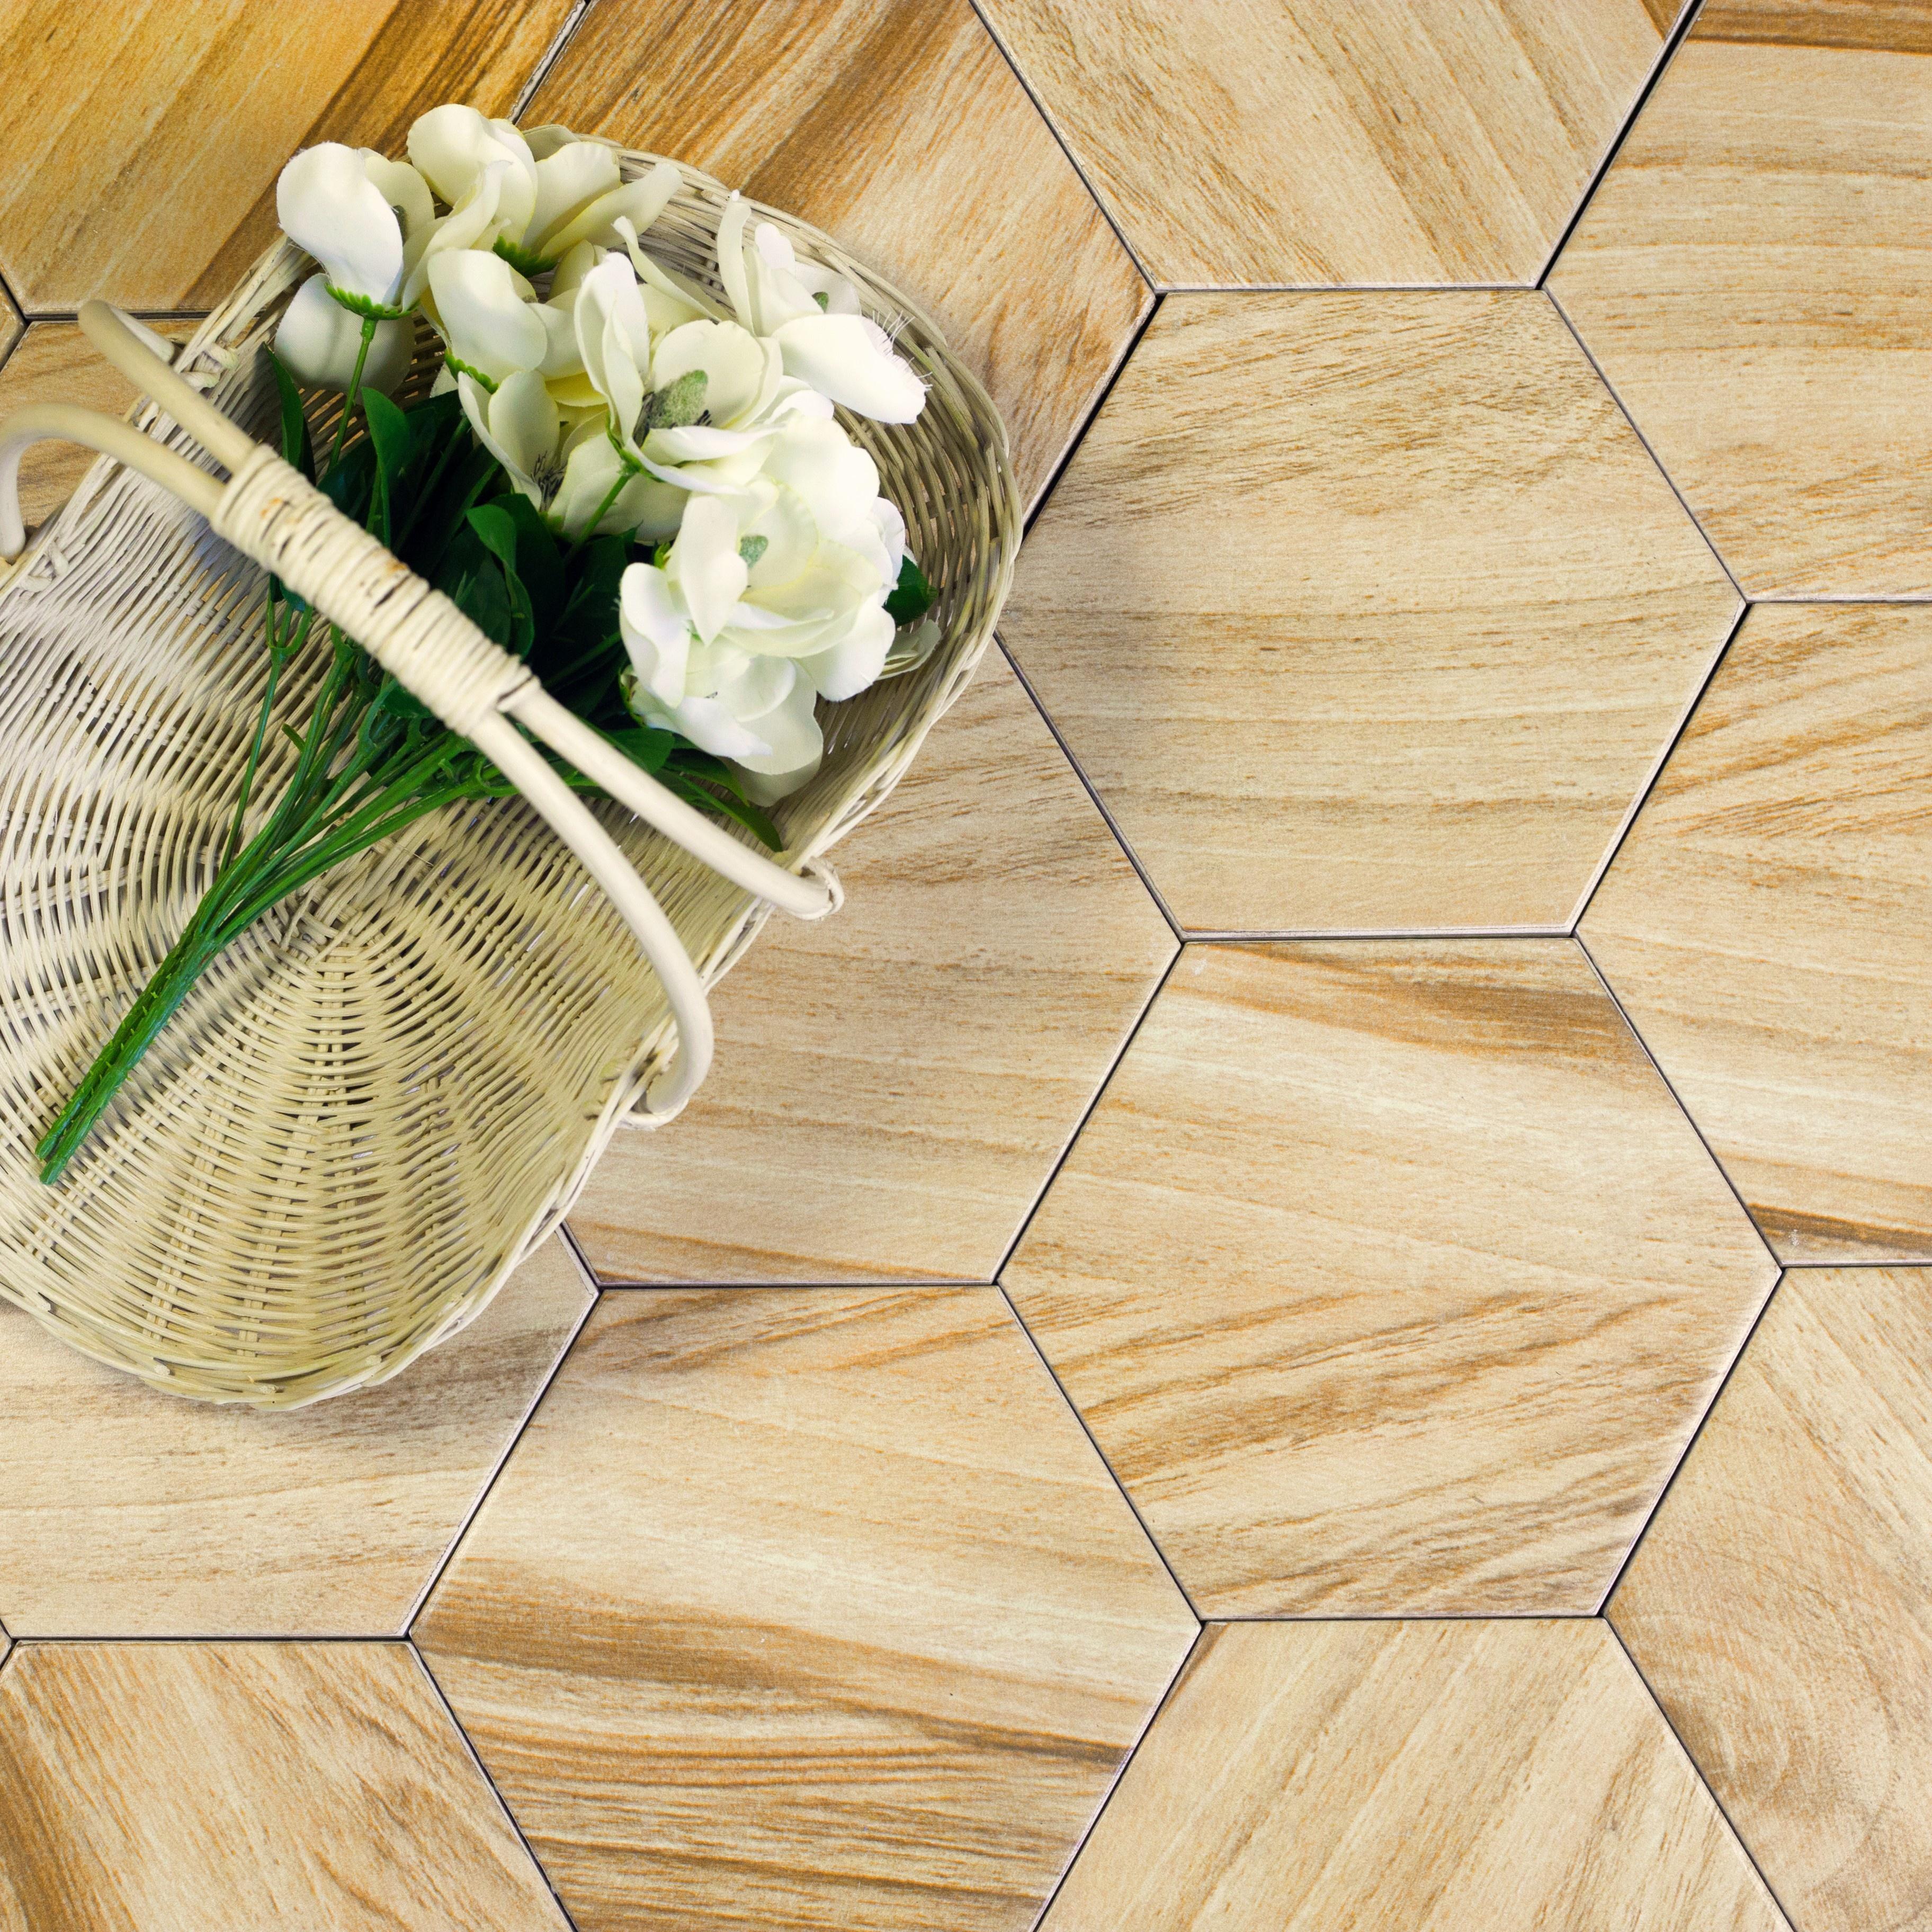 "Artisan Wood 8"" x 8"" Matte Beige Ceramic Hexagon Backsplash Wall & Floor Tile"